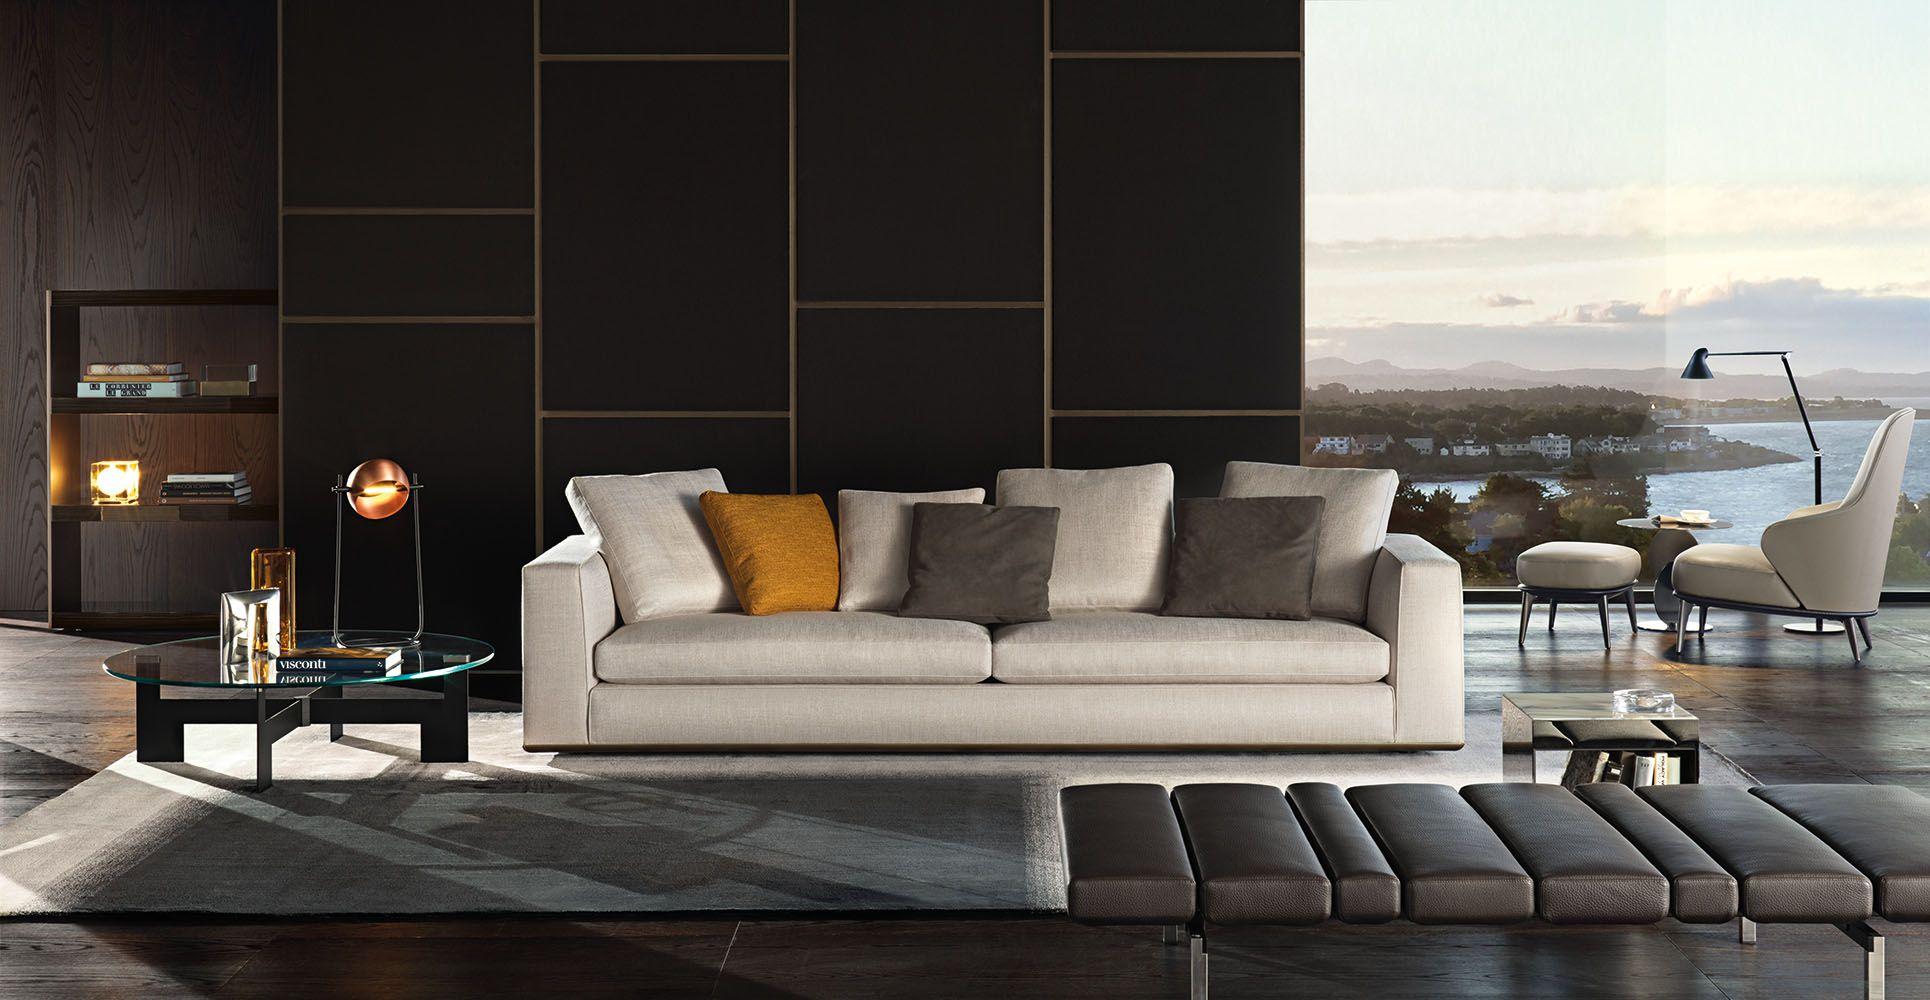 Powell seating system Rodolfo Dordoni design minotti furniture